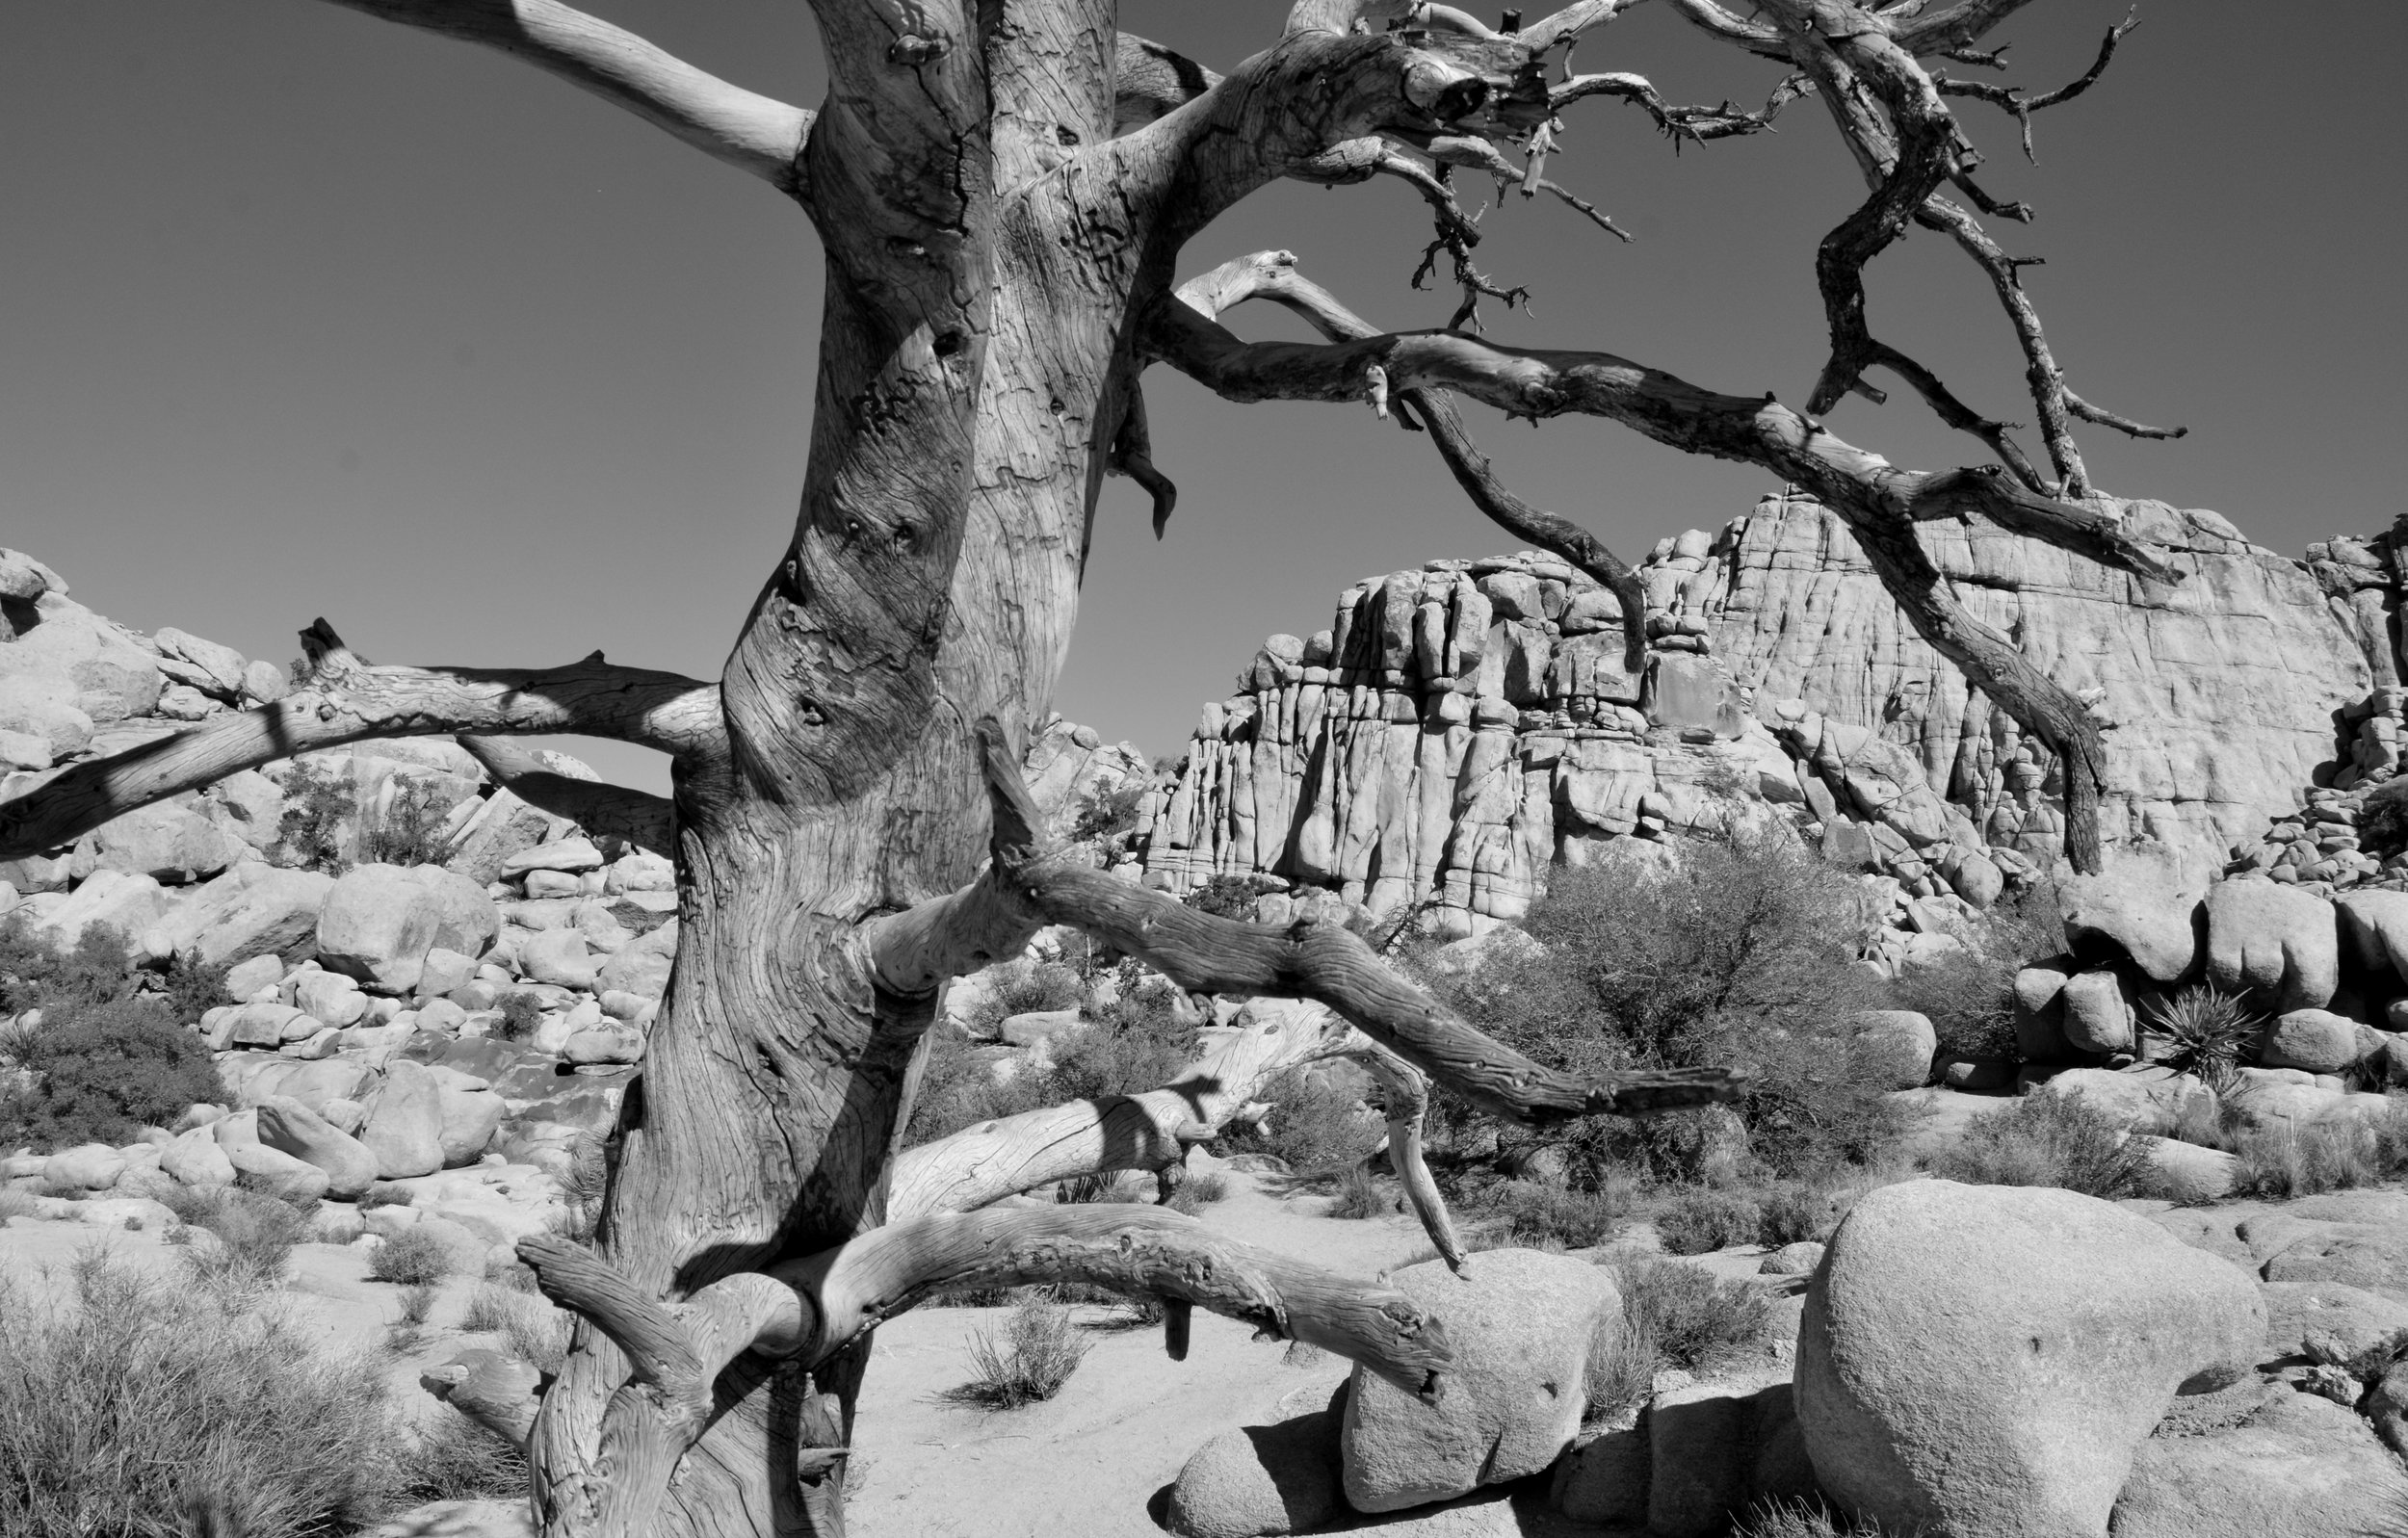 Joshua Tree National Park, Arizona, U.S.A.